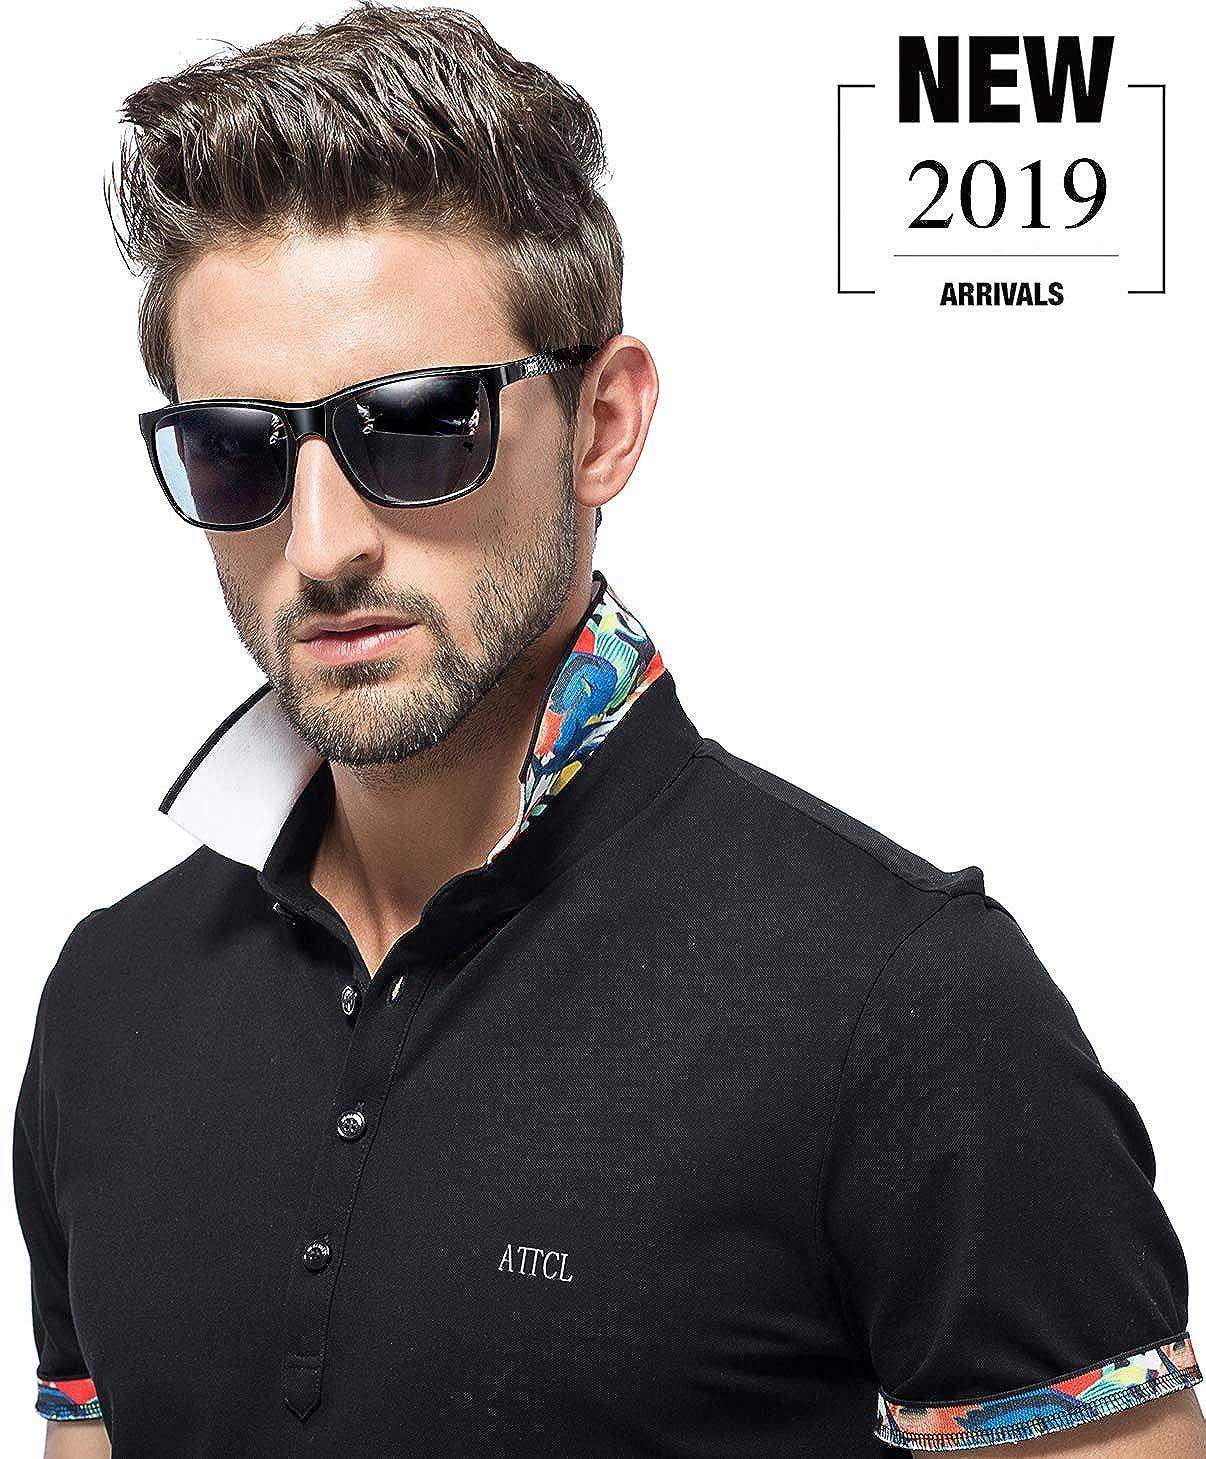 908d6e7dbd Amazon.com  ATTCL Men s Retro Metal Frame Driving Polarized Sunglasses For  Men 18587black  Clothing